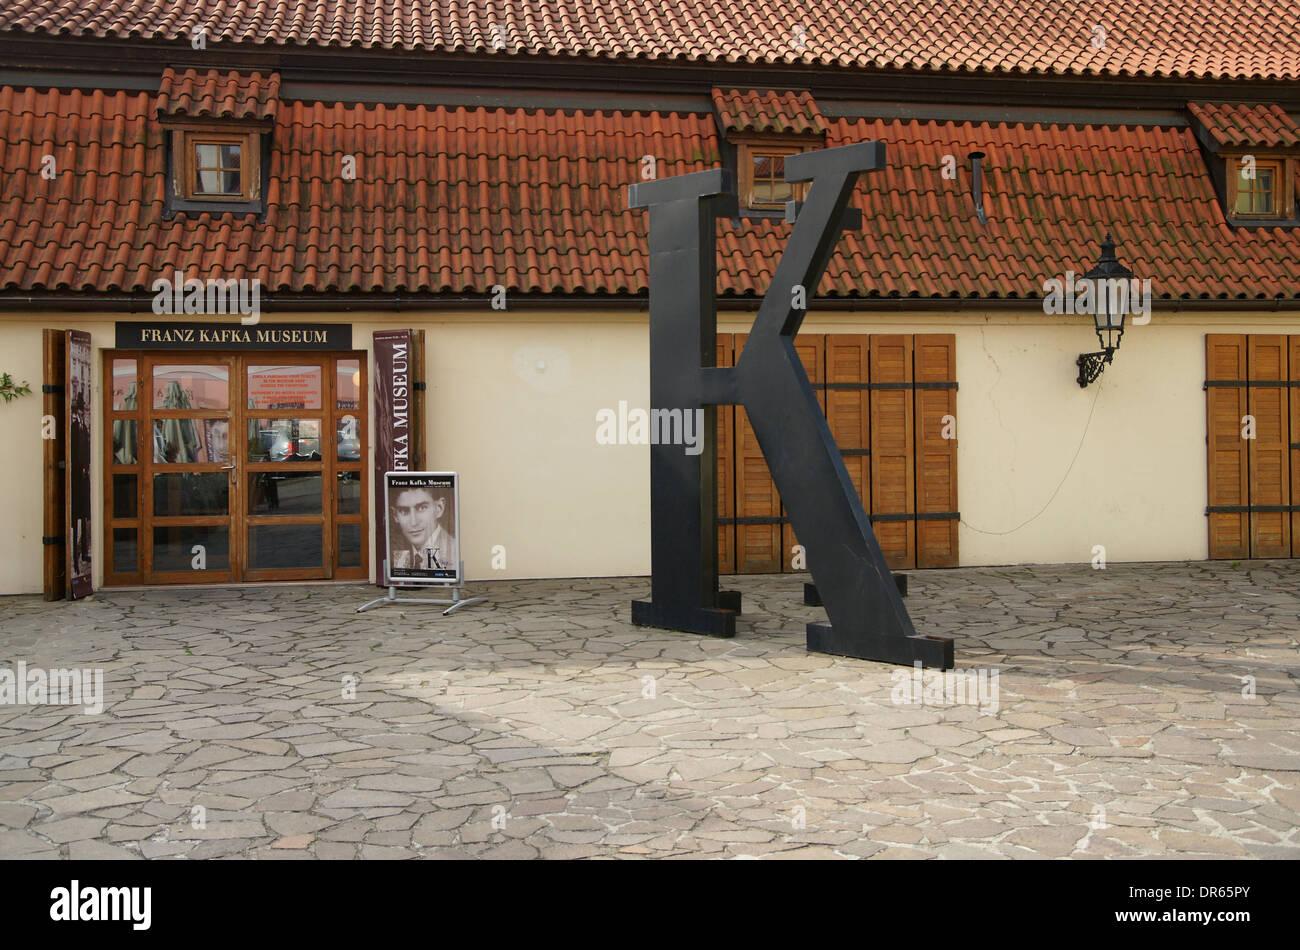 Tschechische Republik. Prag. Franz-Kafka-Museum. (Mala Strana). Stockfoto